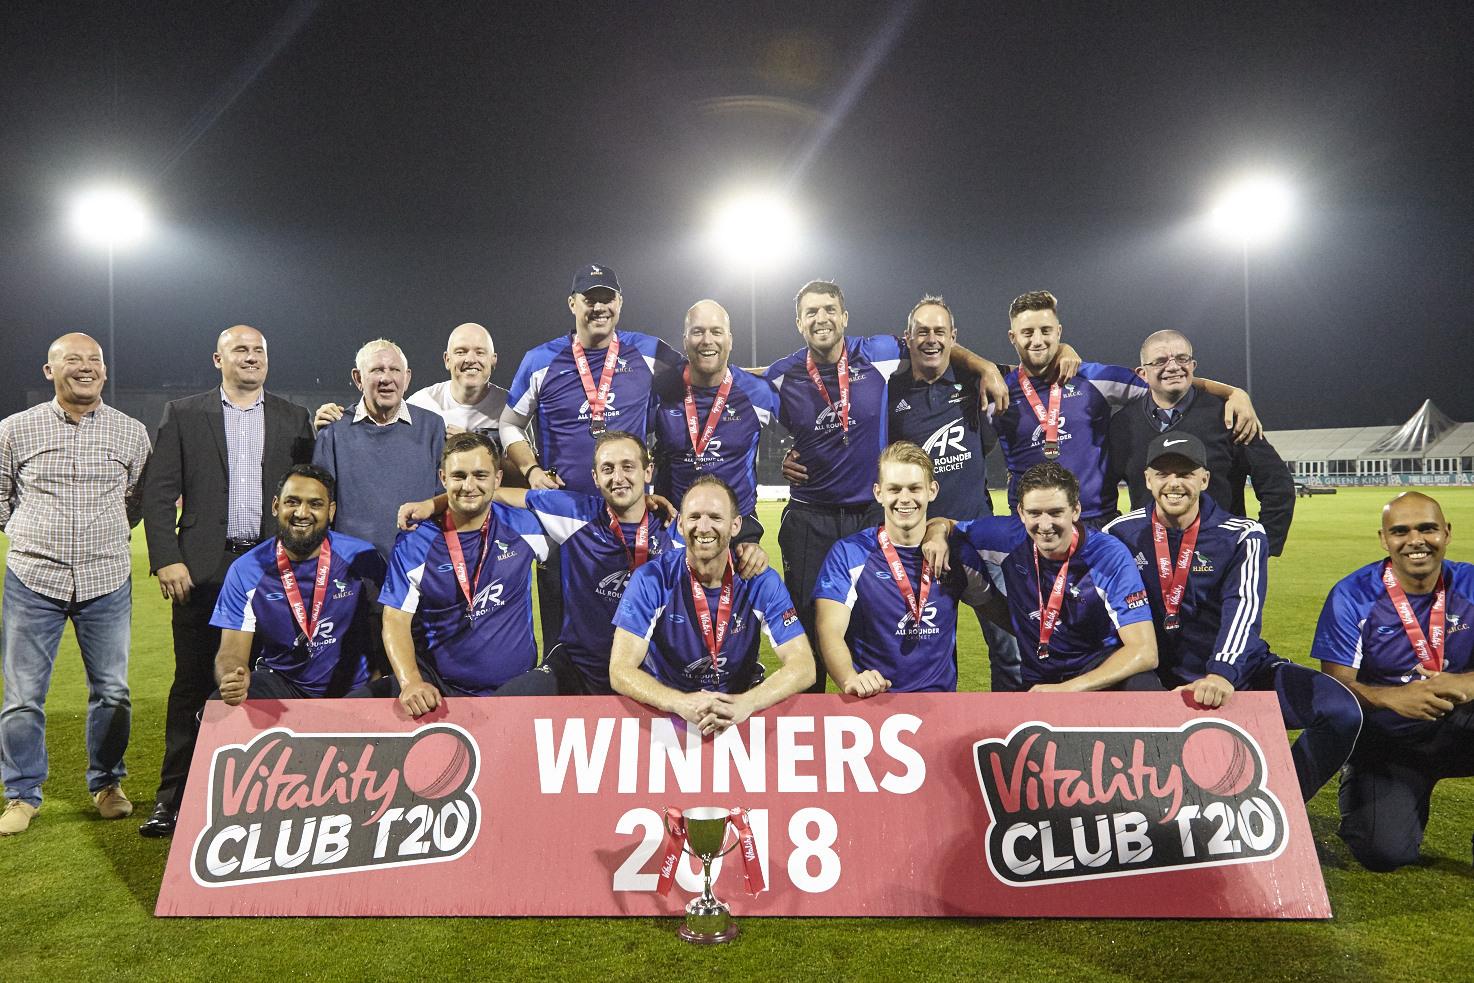 HHCC_T20_Winners_2018